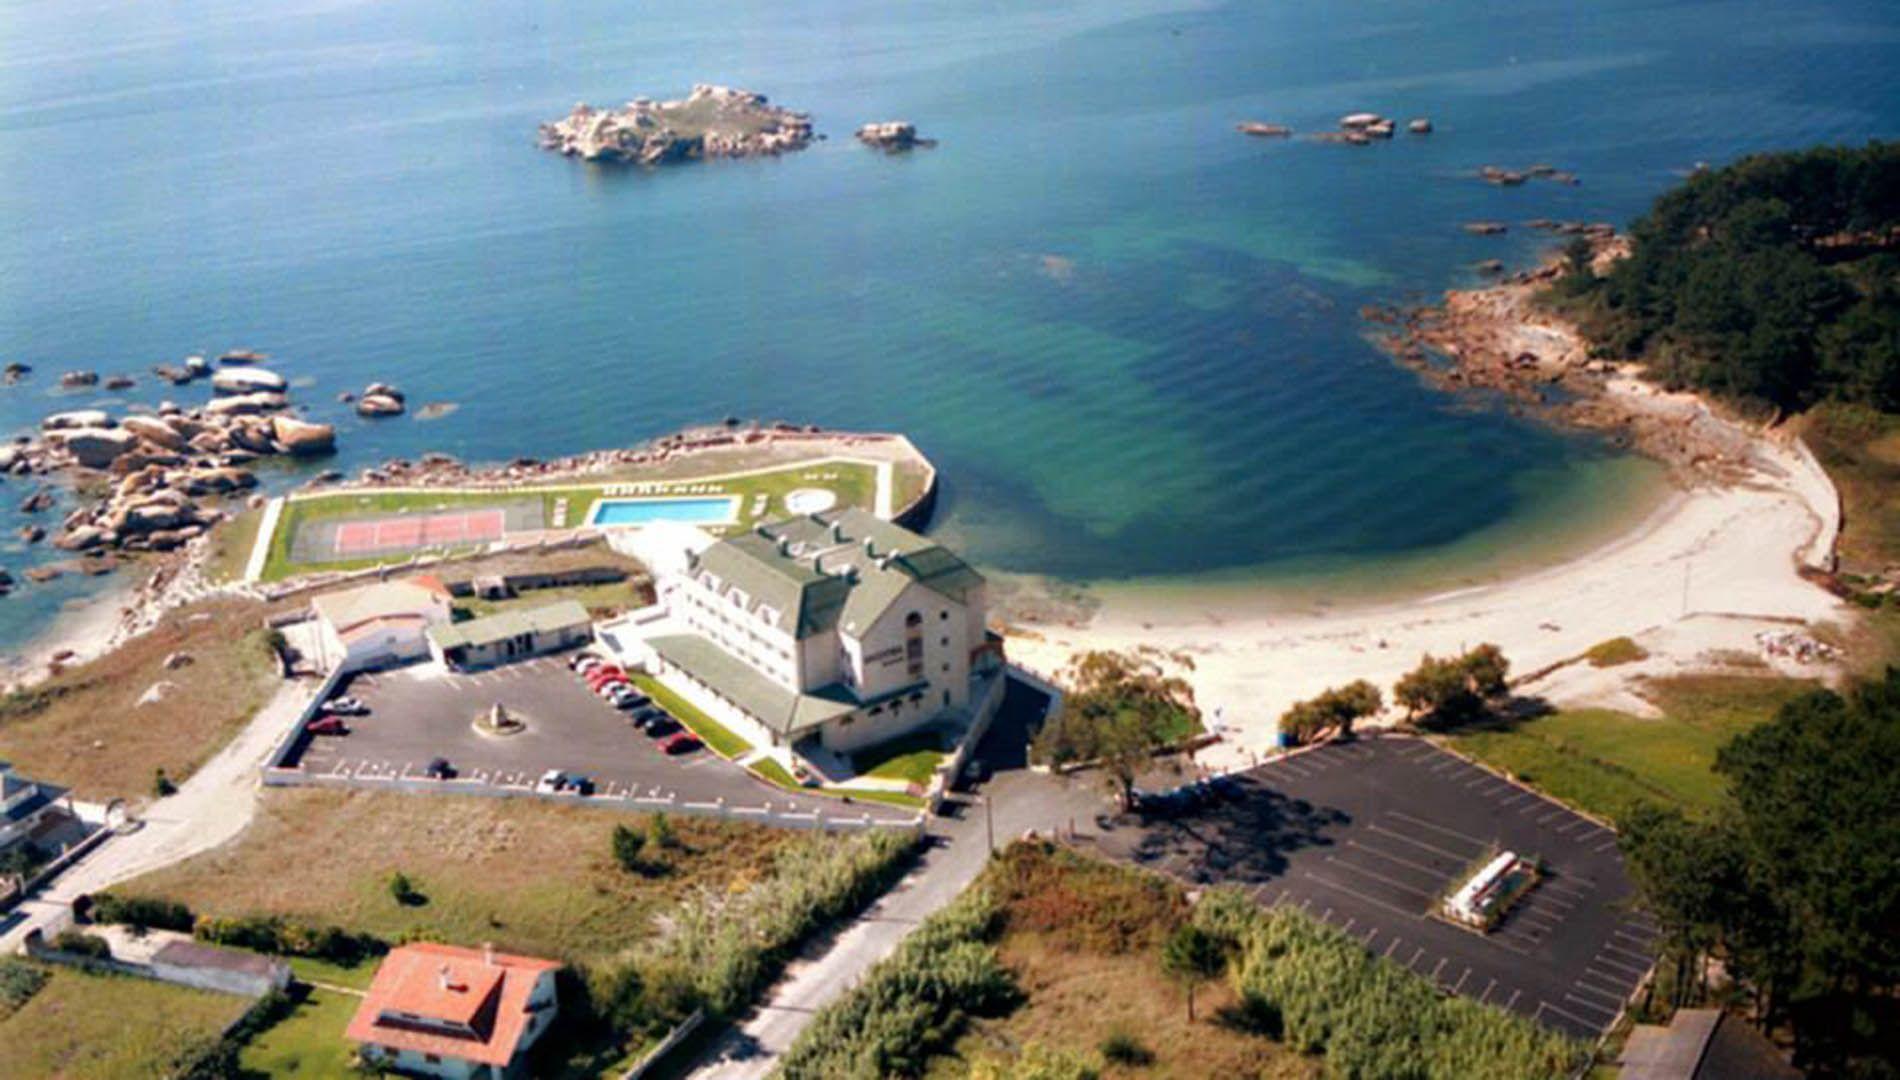 Septiembre en Rías Baixas: HOTEL 4* CON CANCELACIÓN POR 18,50€ p.p./noche